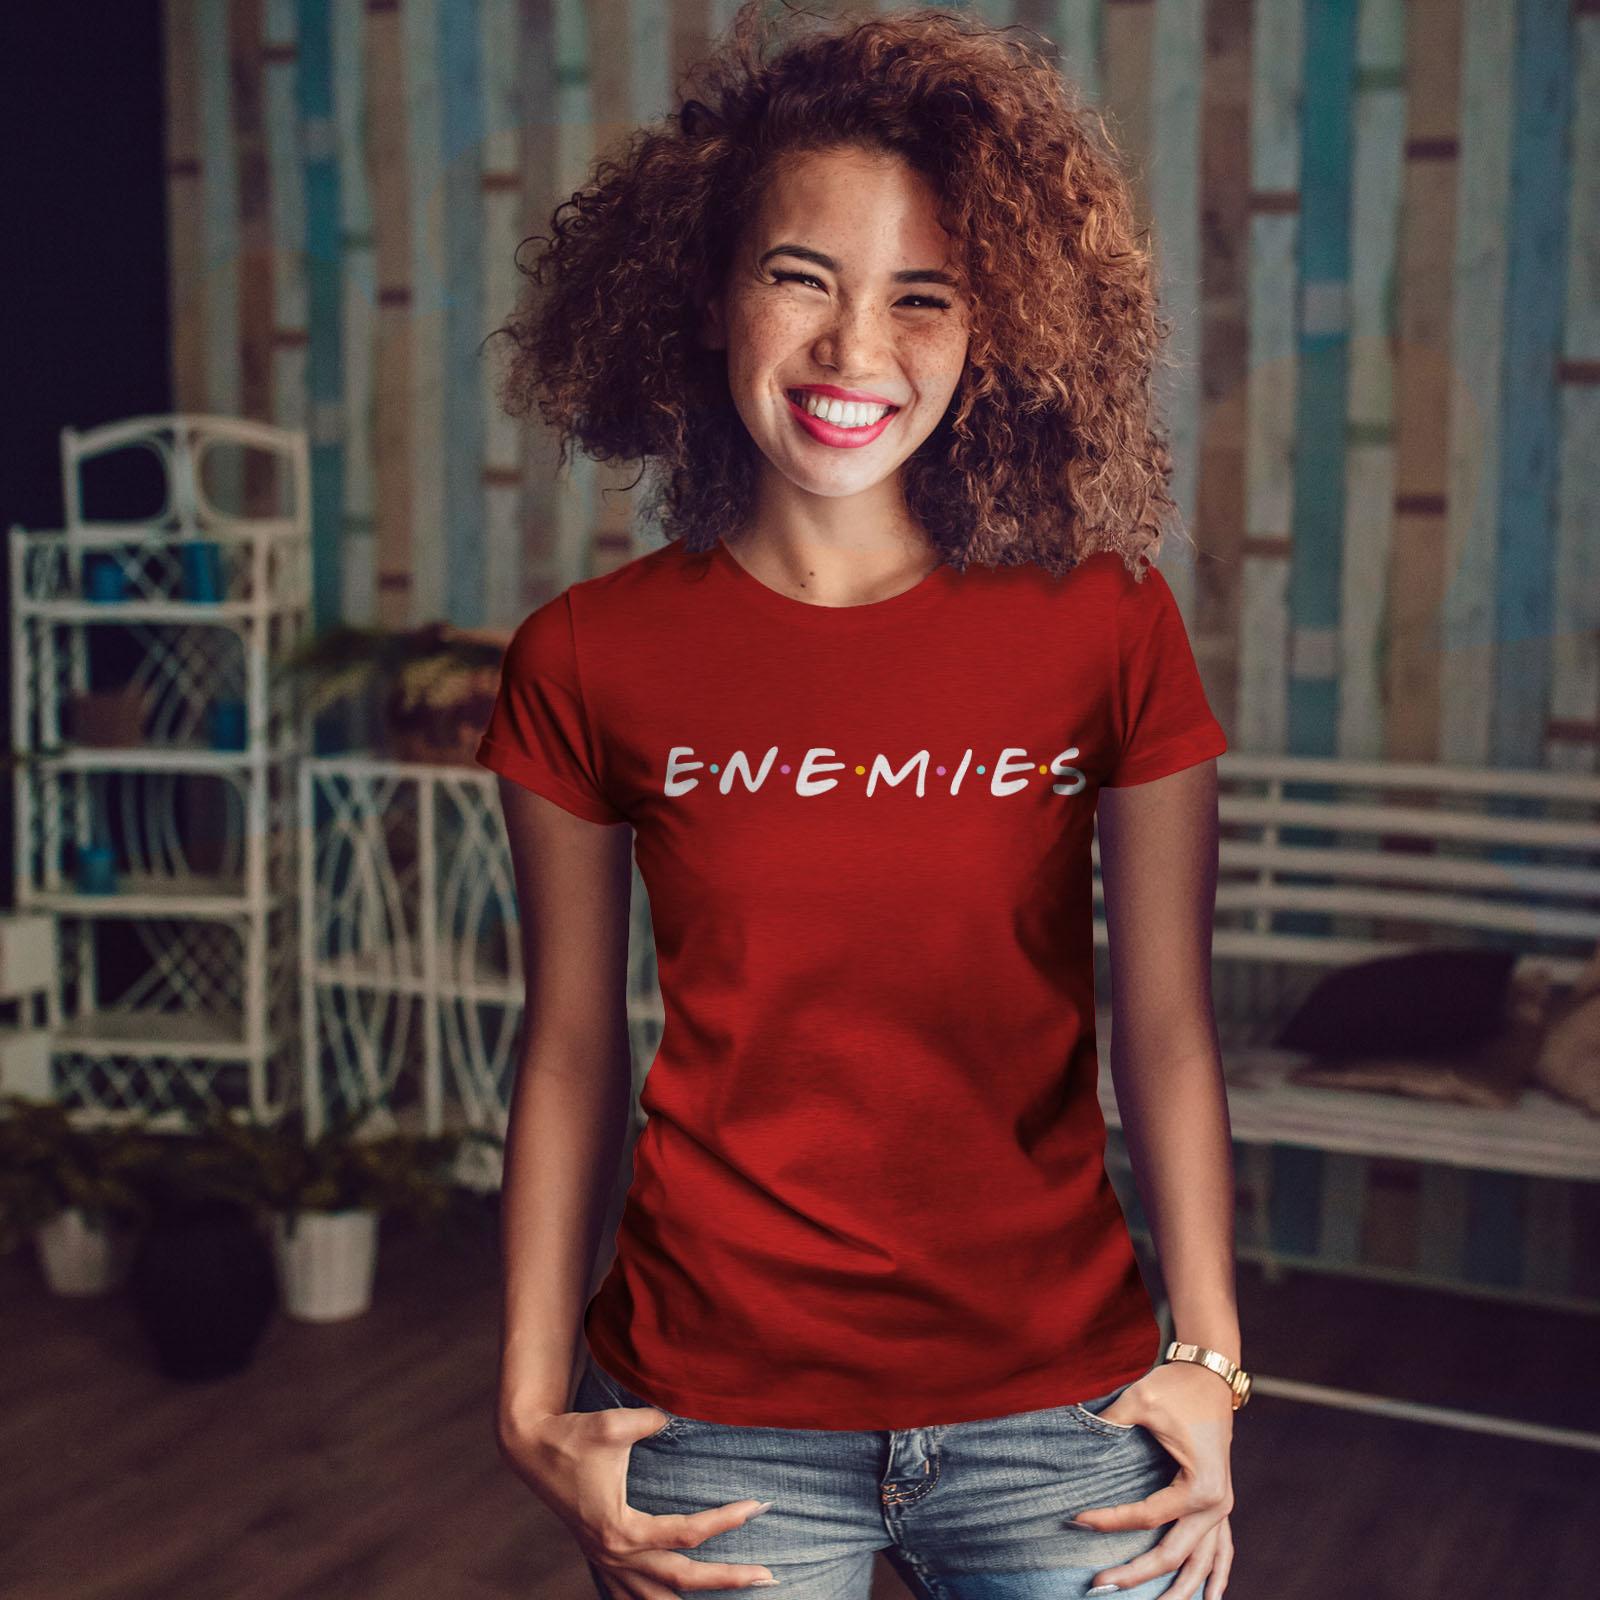 Wellcoda-Freunde-oder-Feinde-Damen-T-Shirt-Serie-Casual-Design-Printed-Tee Indexbild 10